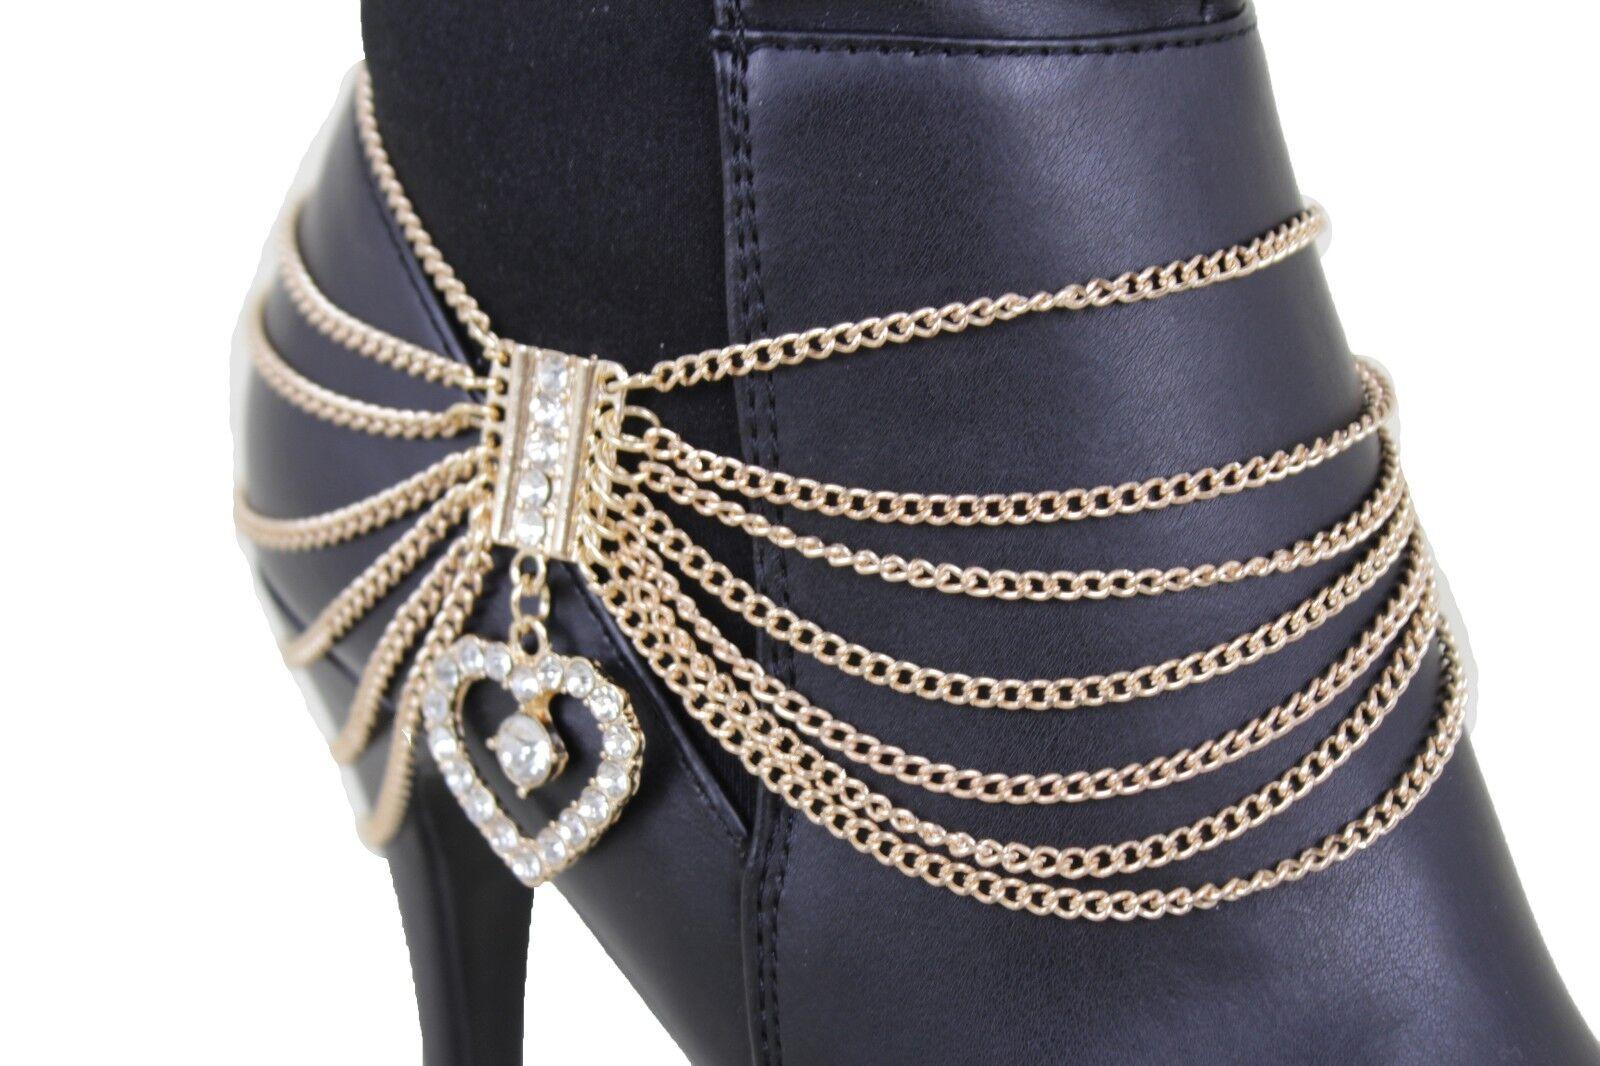 Friendship Women Gold Metal Chain Boot Bracelet Shoe Anklet Love Heart Charm Fun